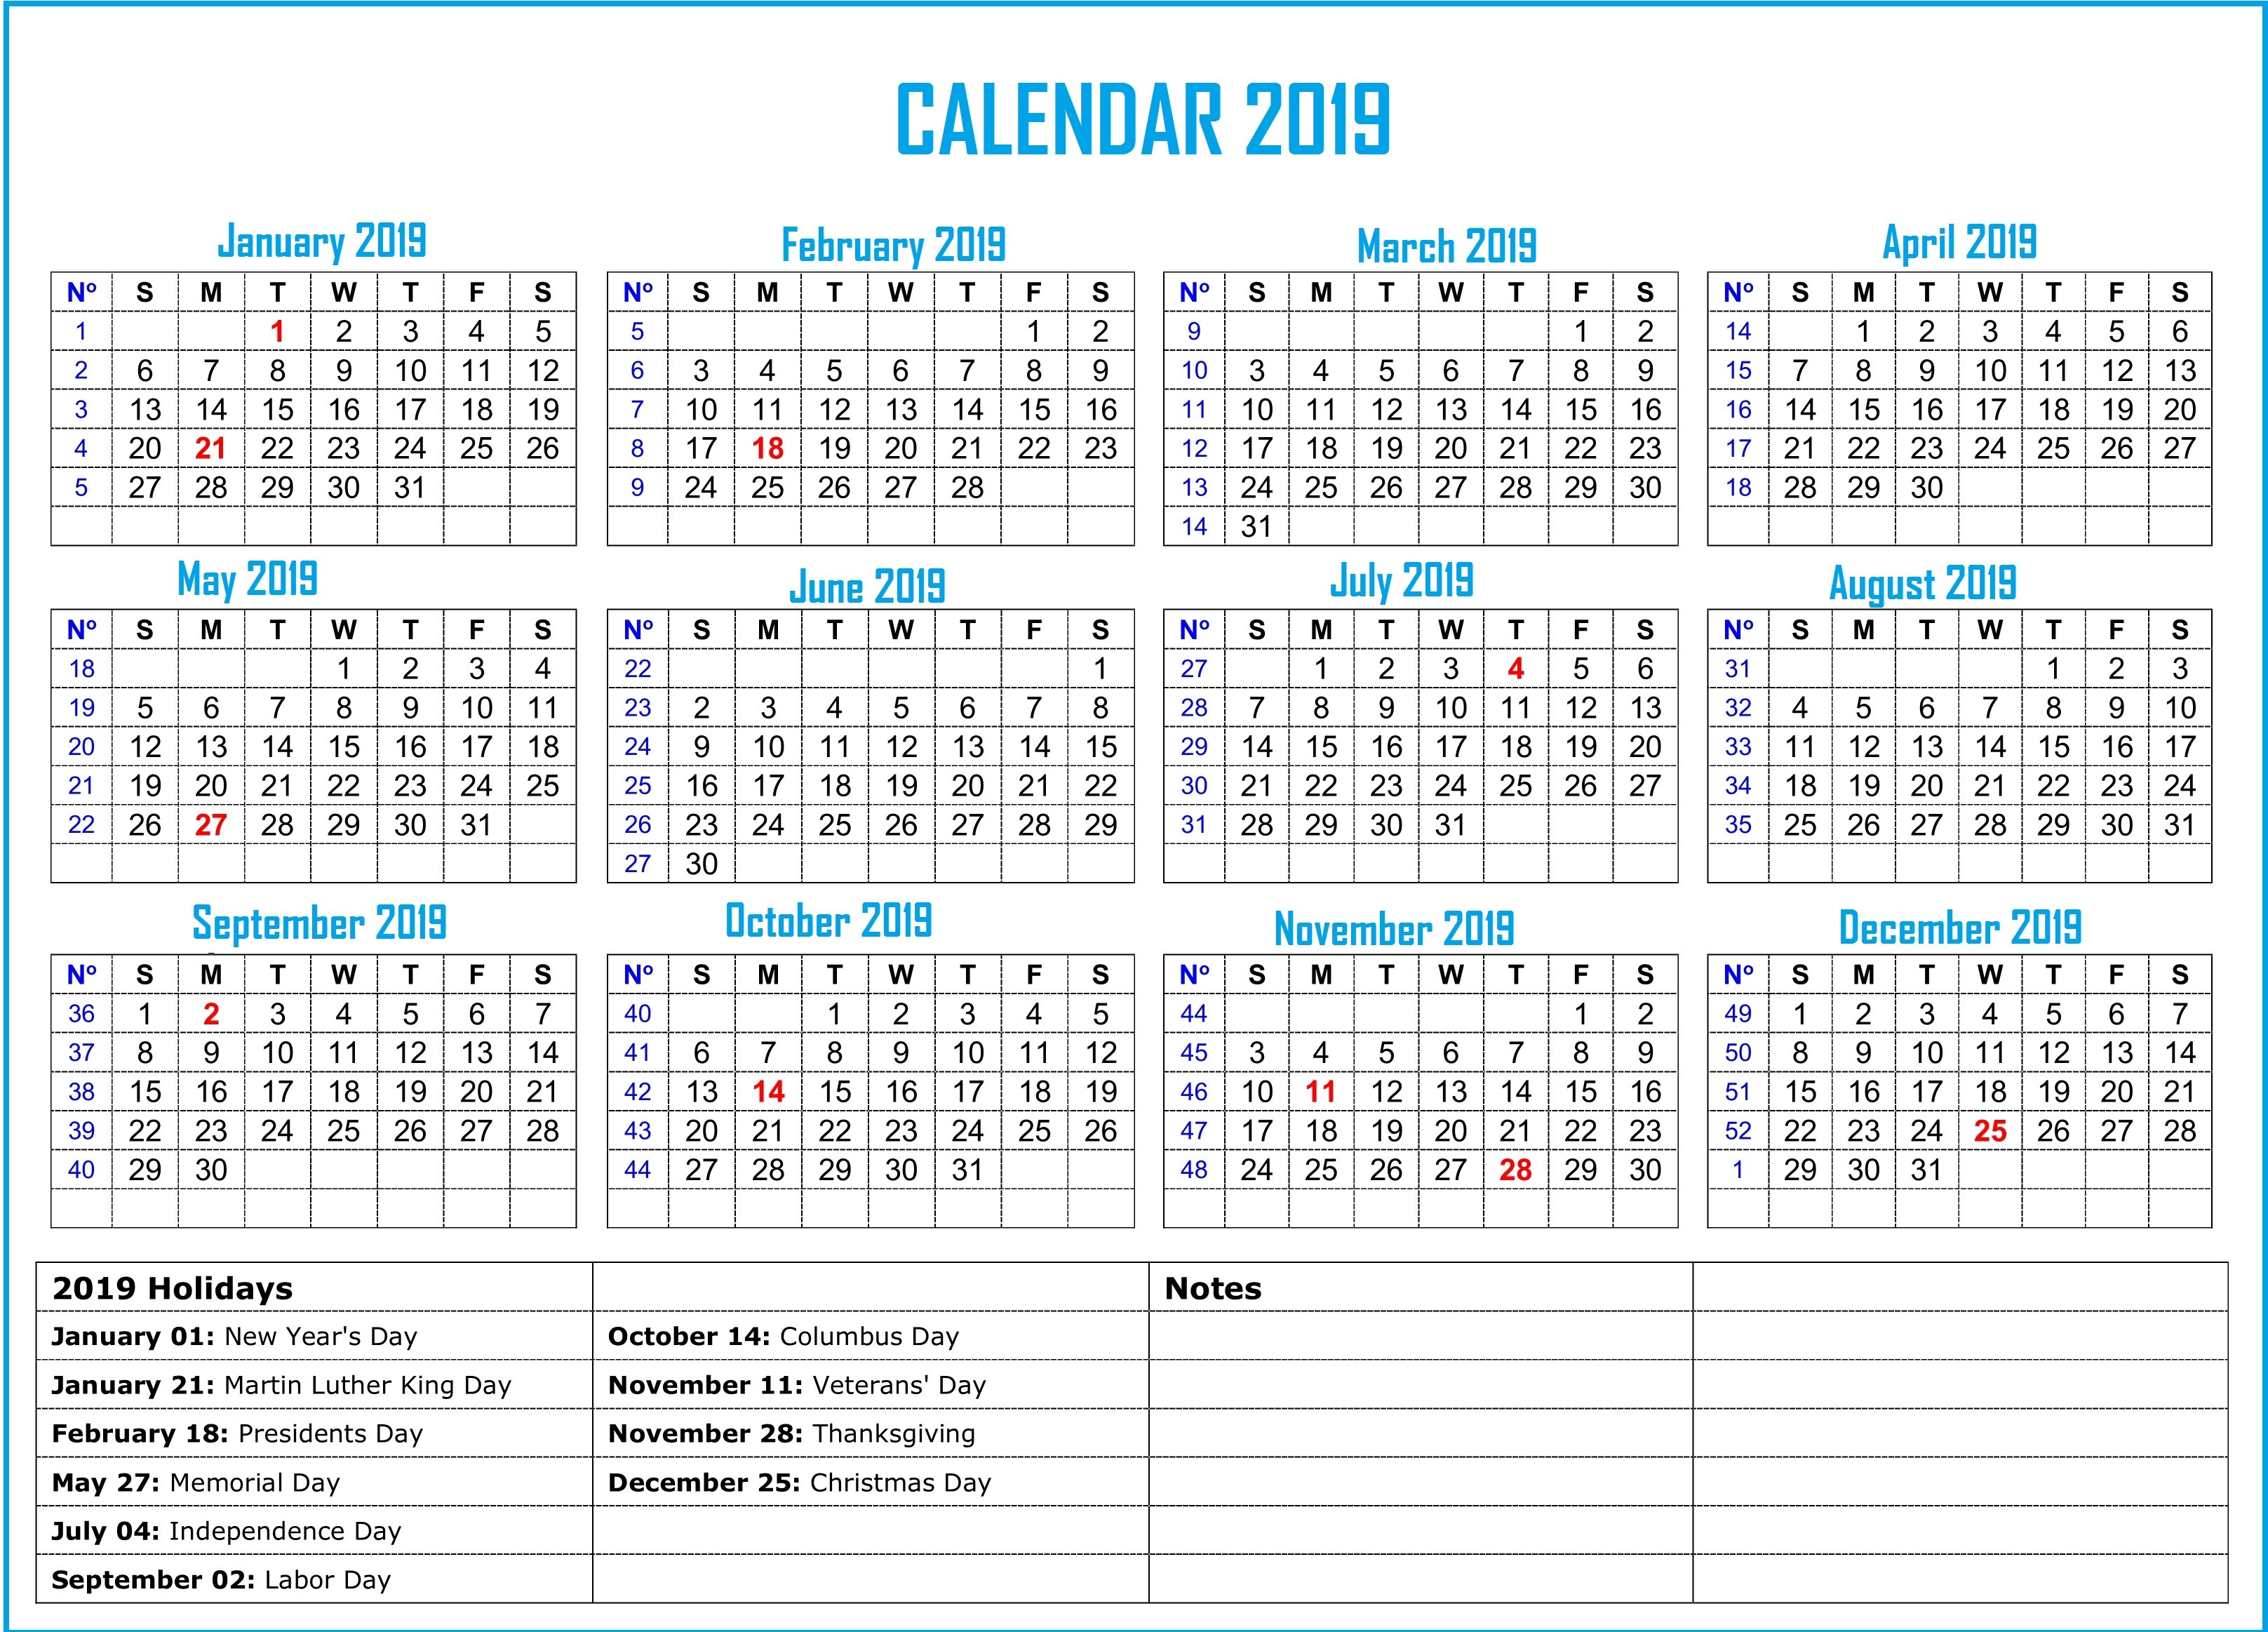 2019 Calendar with Holidays Printable 2019 Calendar with Holidays